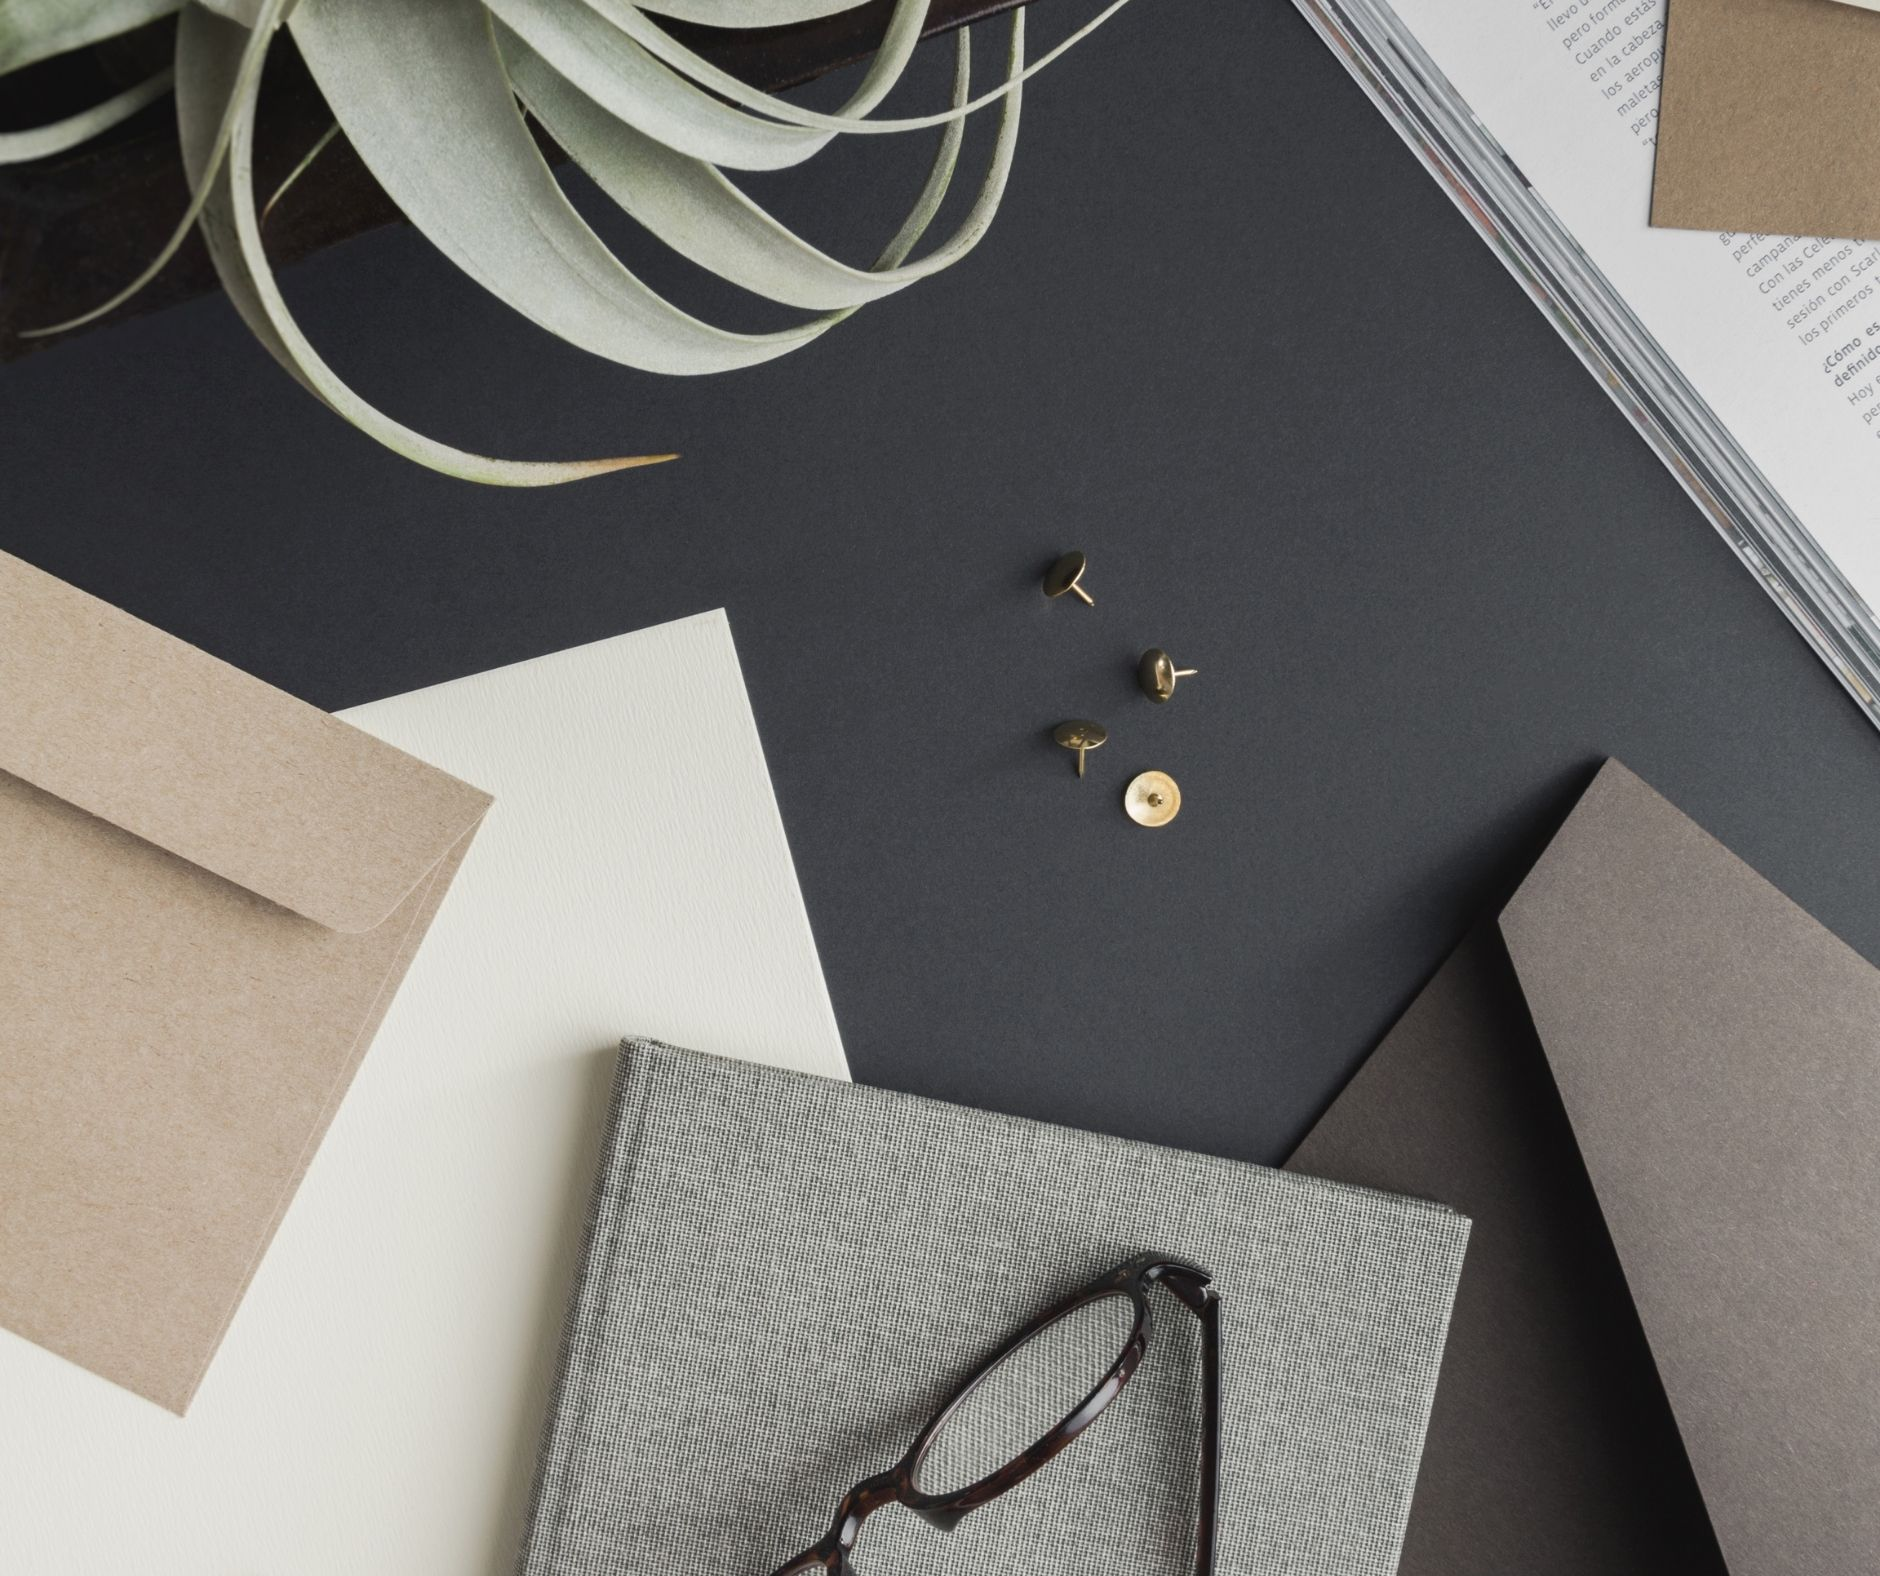 Studio Anansi Website Design in Portland Oregon